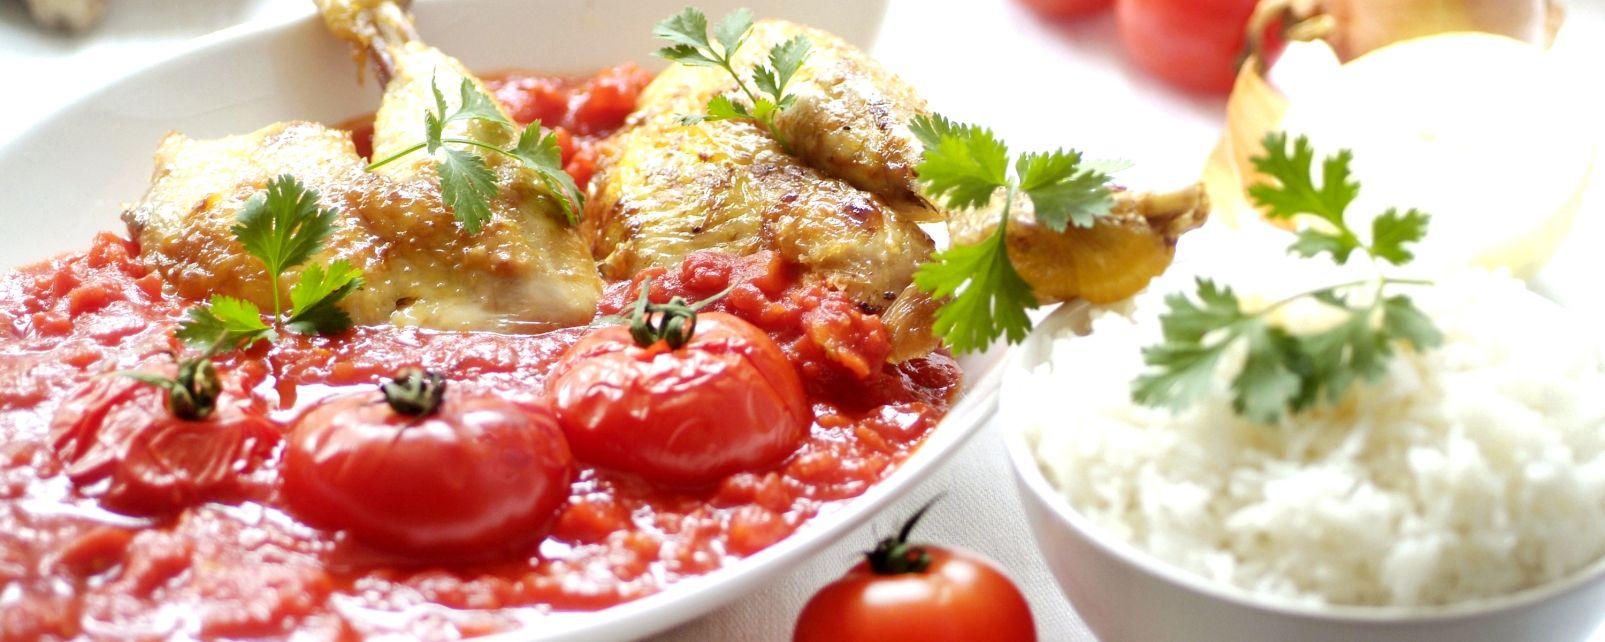 Mauritian cuisine, Mauritius, Mauritian cuisine, Arts and culture, Mauritius